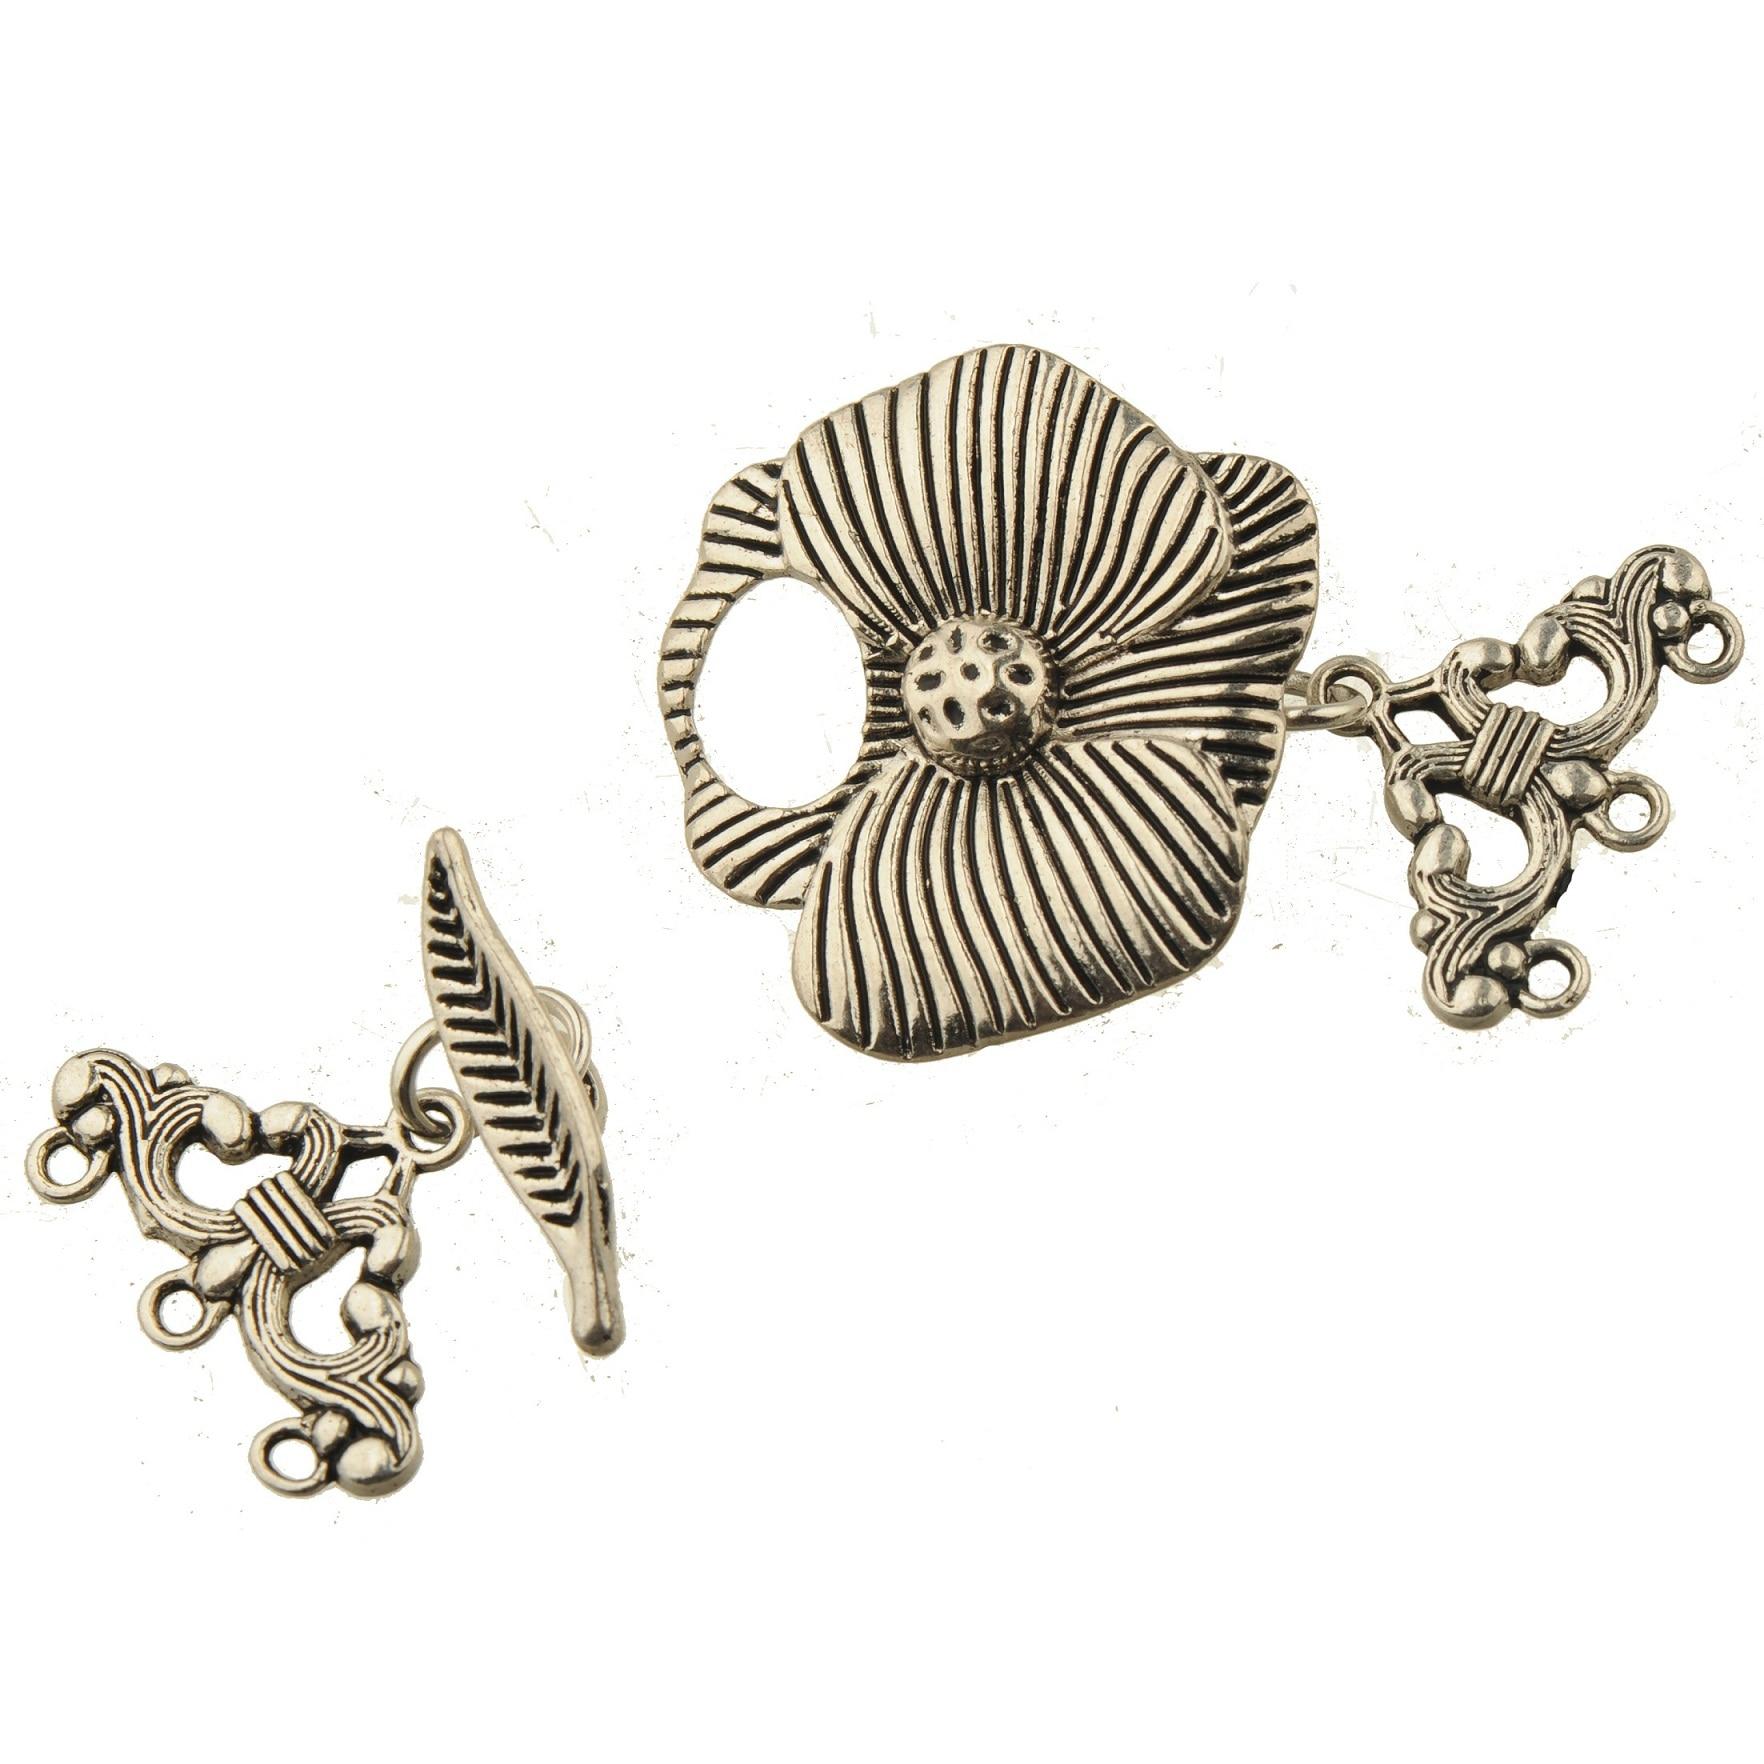 Big Flower Clasps Fit Multi Bracelets DIY Hooks Vintage Silver Lotus Triangle 3/4 Holes Handwork Jewelery Findings Metal 5 Sets